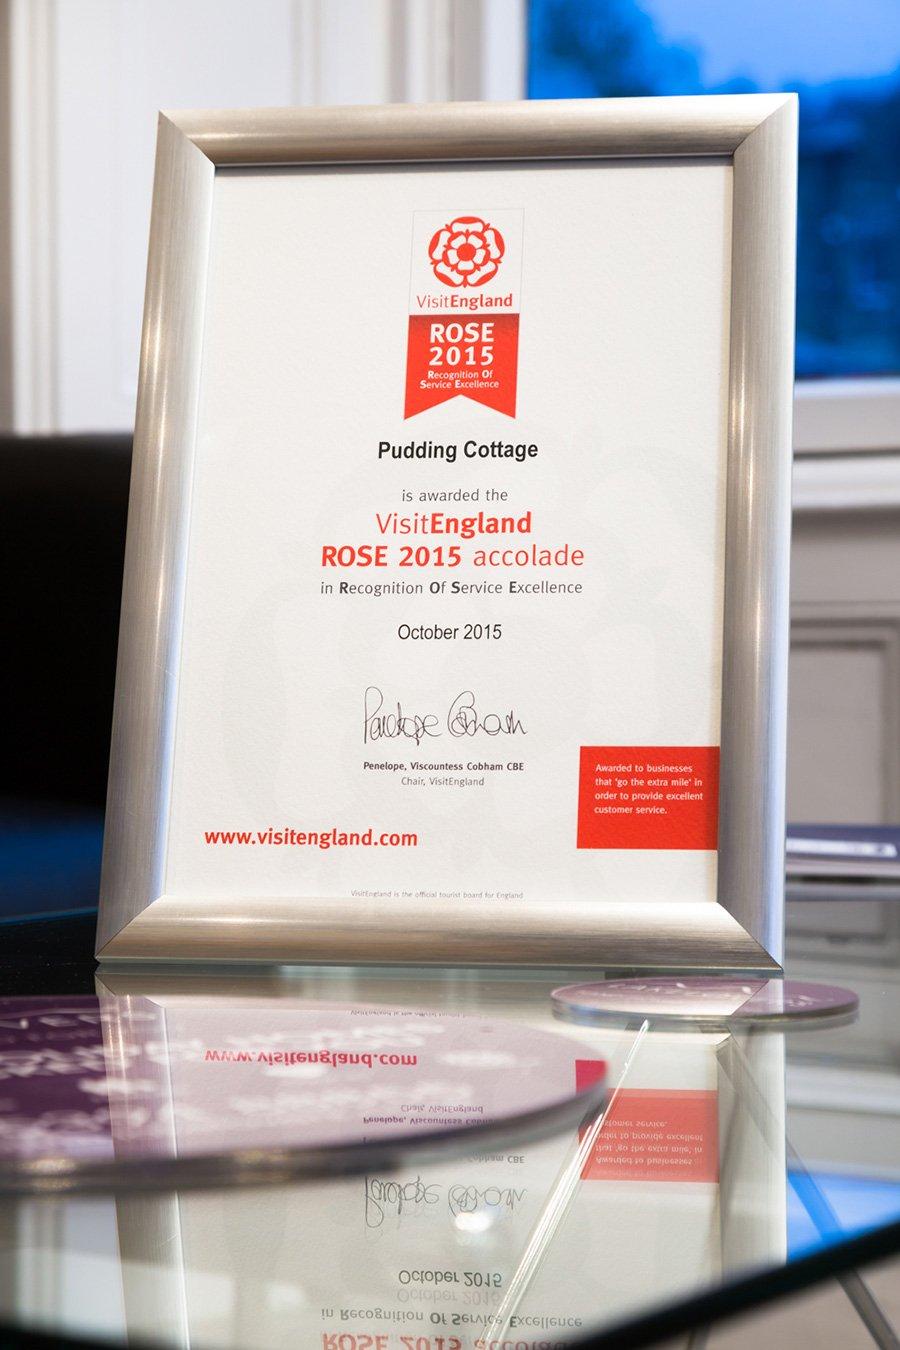 Pudding Cottage is awarded VisitEngland ROSE Award 2015 for excellent service